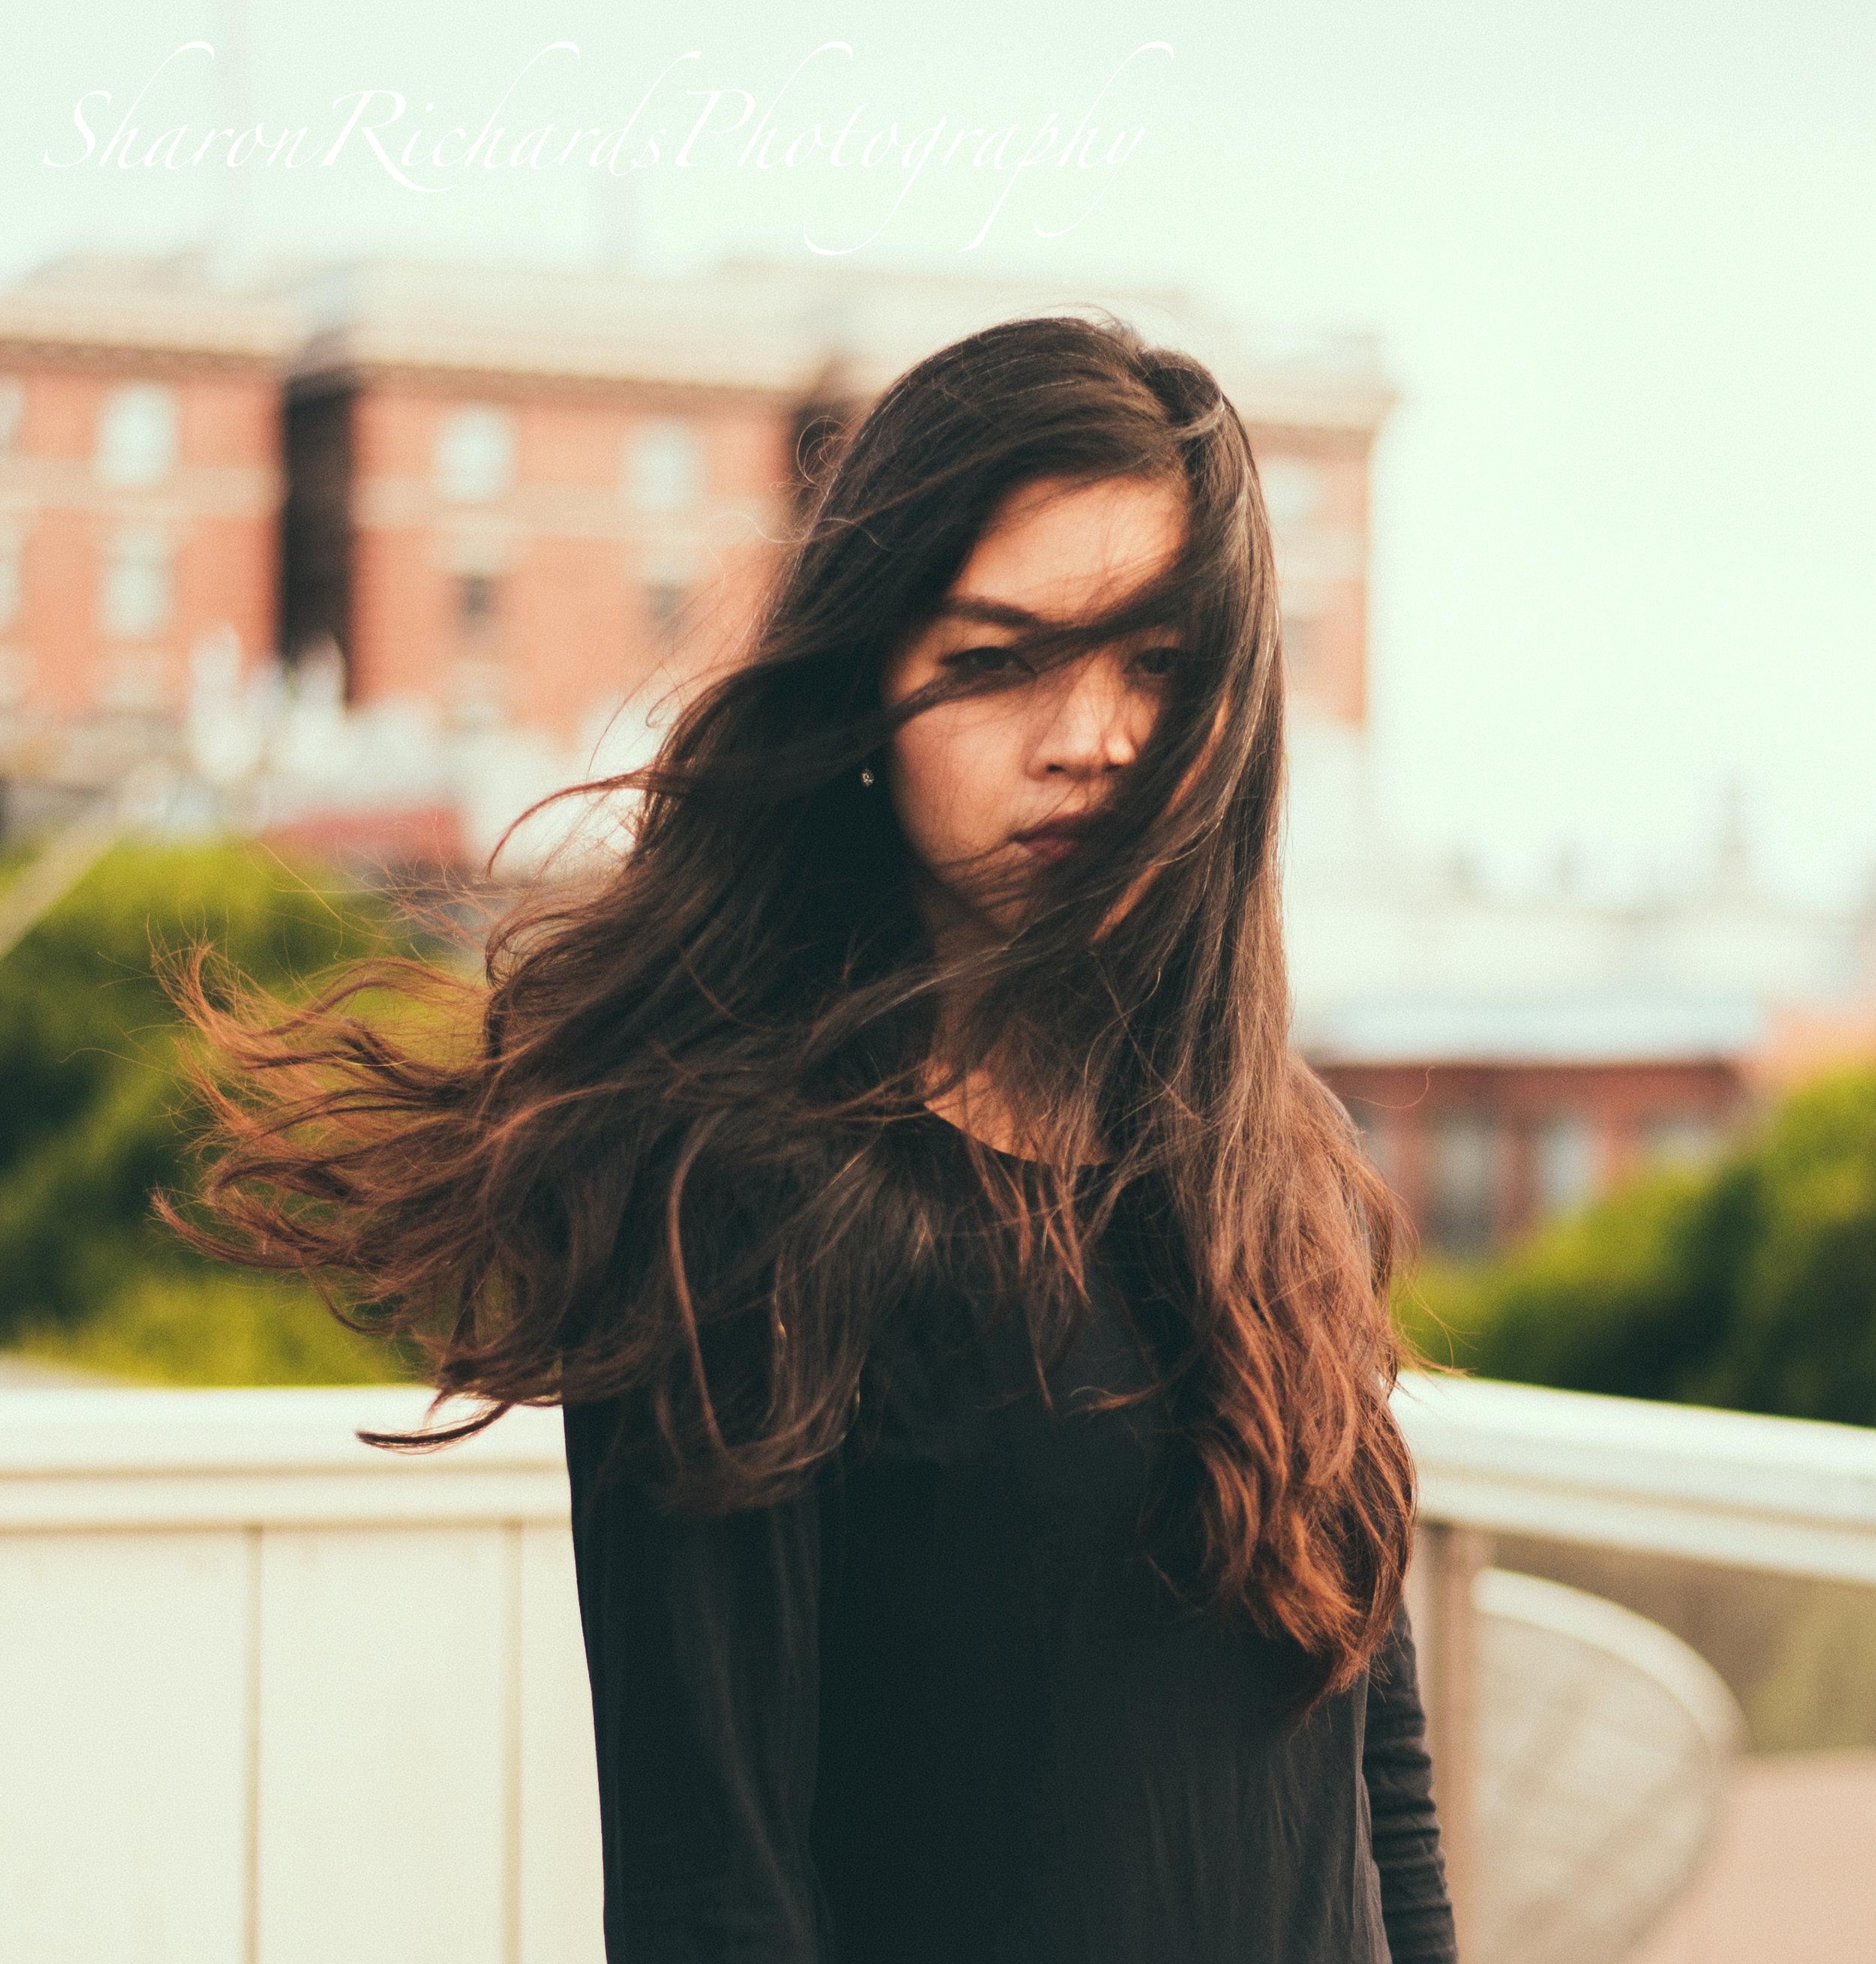 Self Portrait - Sharon Richards Photography